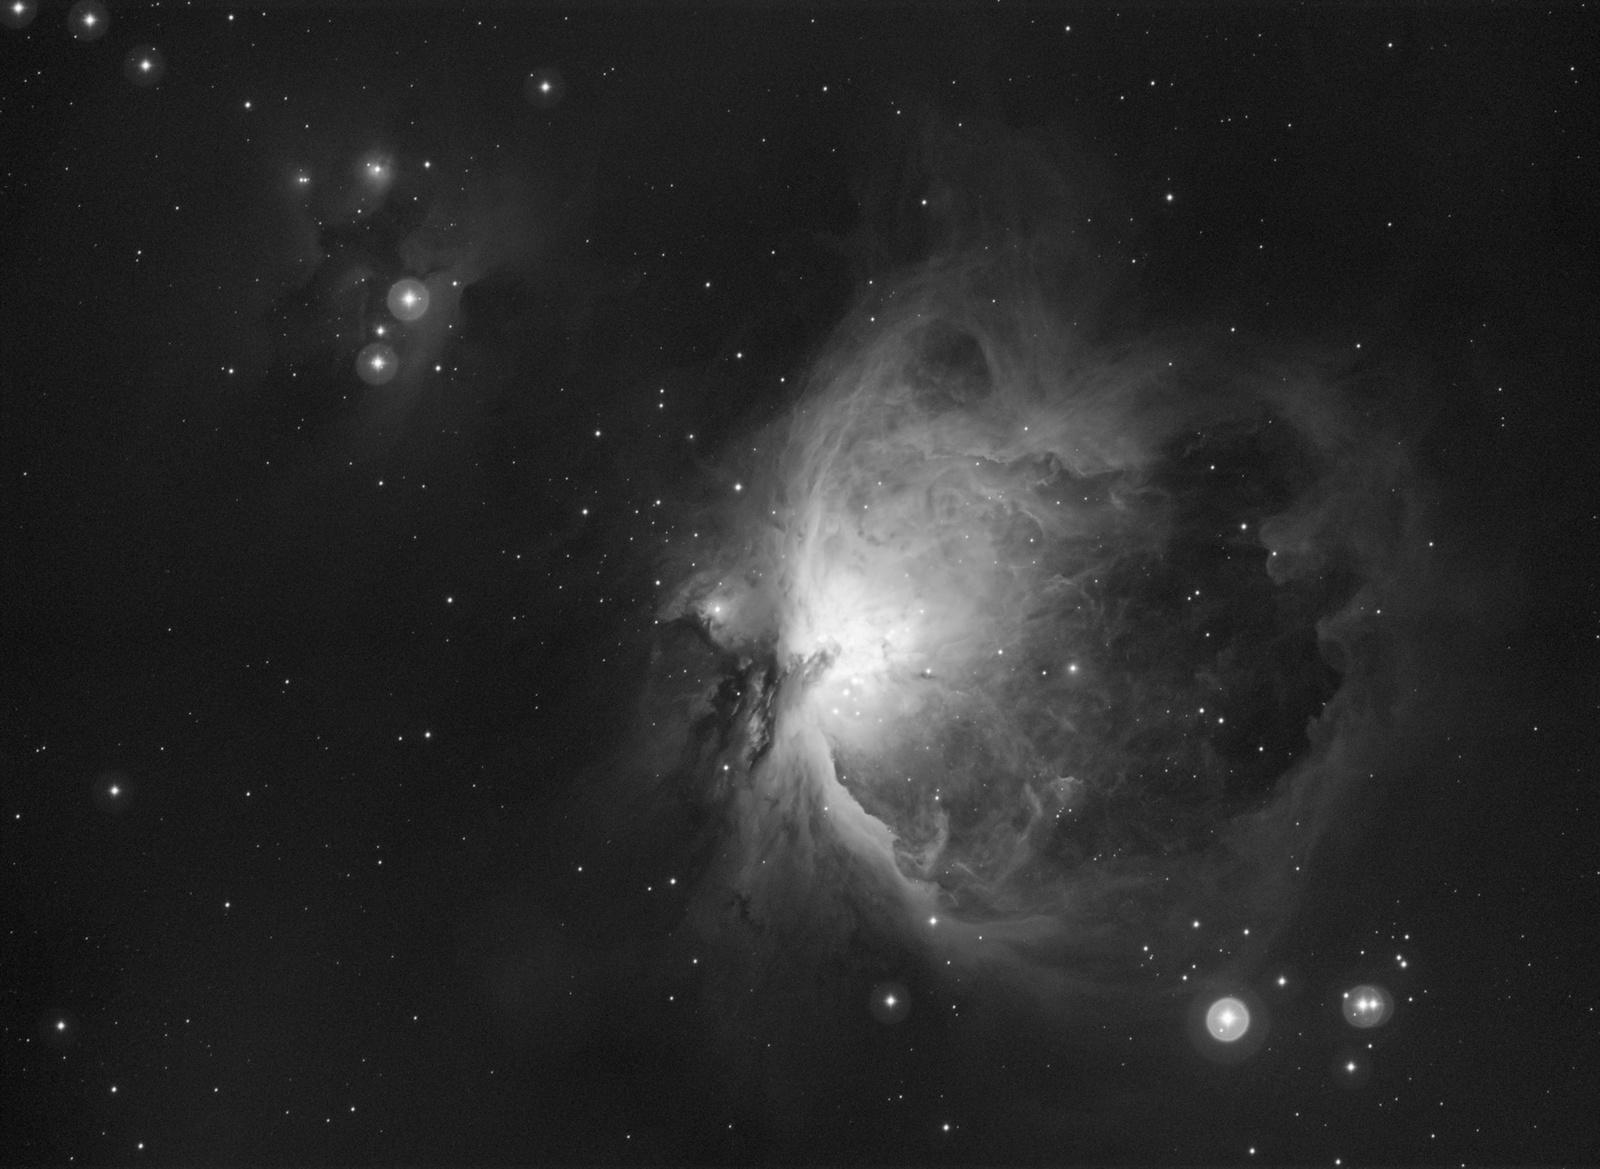 OIII_SC_noB_cr_HT_ARGDRK_core_stars_bckgr_OK_HDR_LHE_MASK_FLAT_1920px.jpg